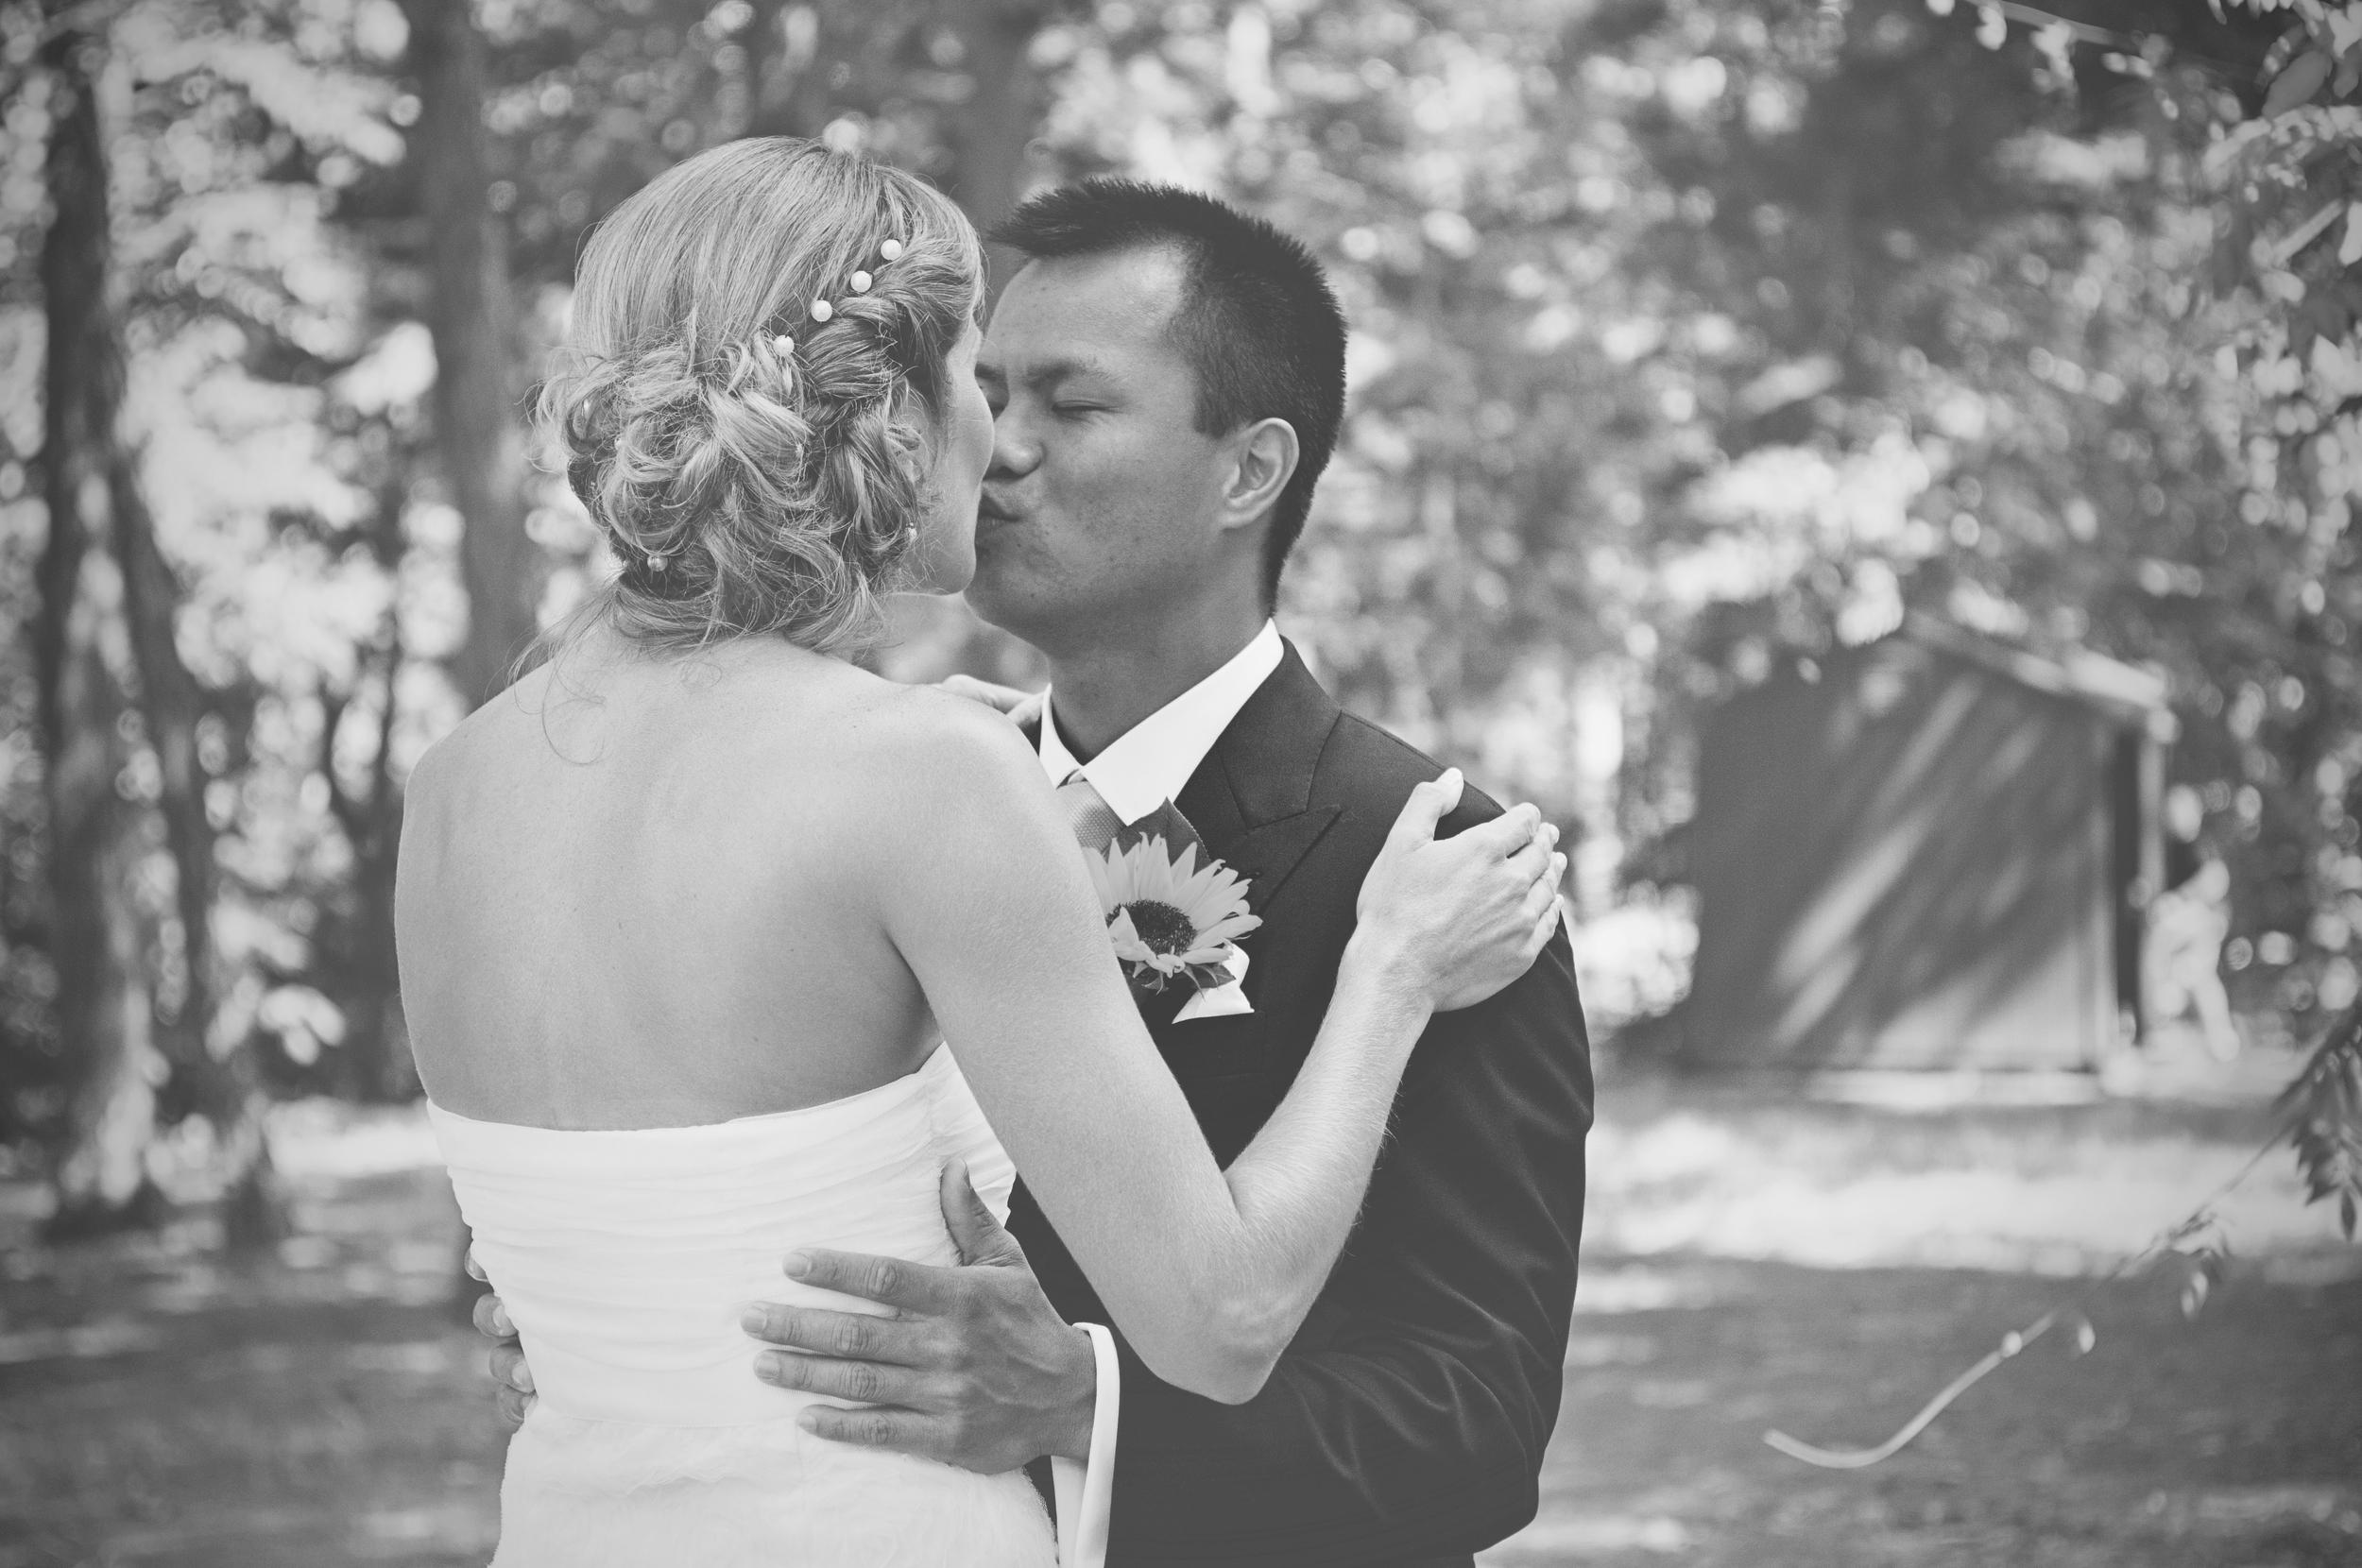 Angela_Chicoski_CT_wedding_photographer_020.jpg